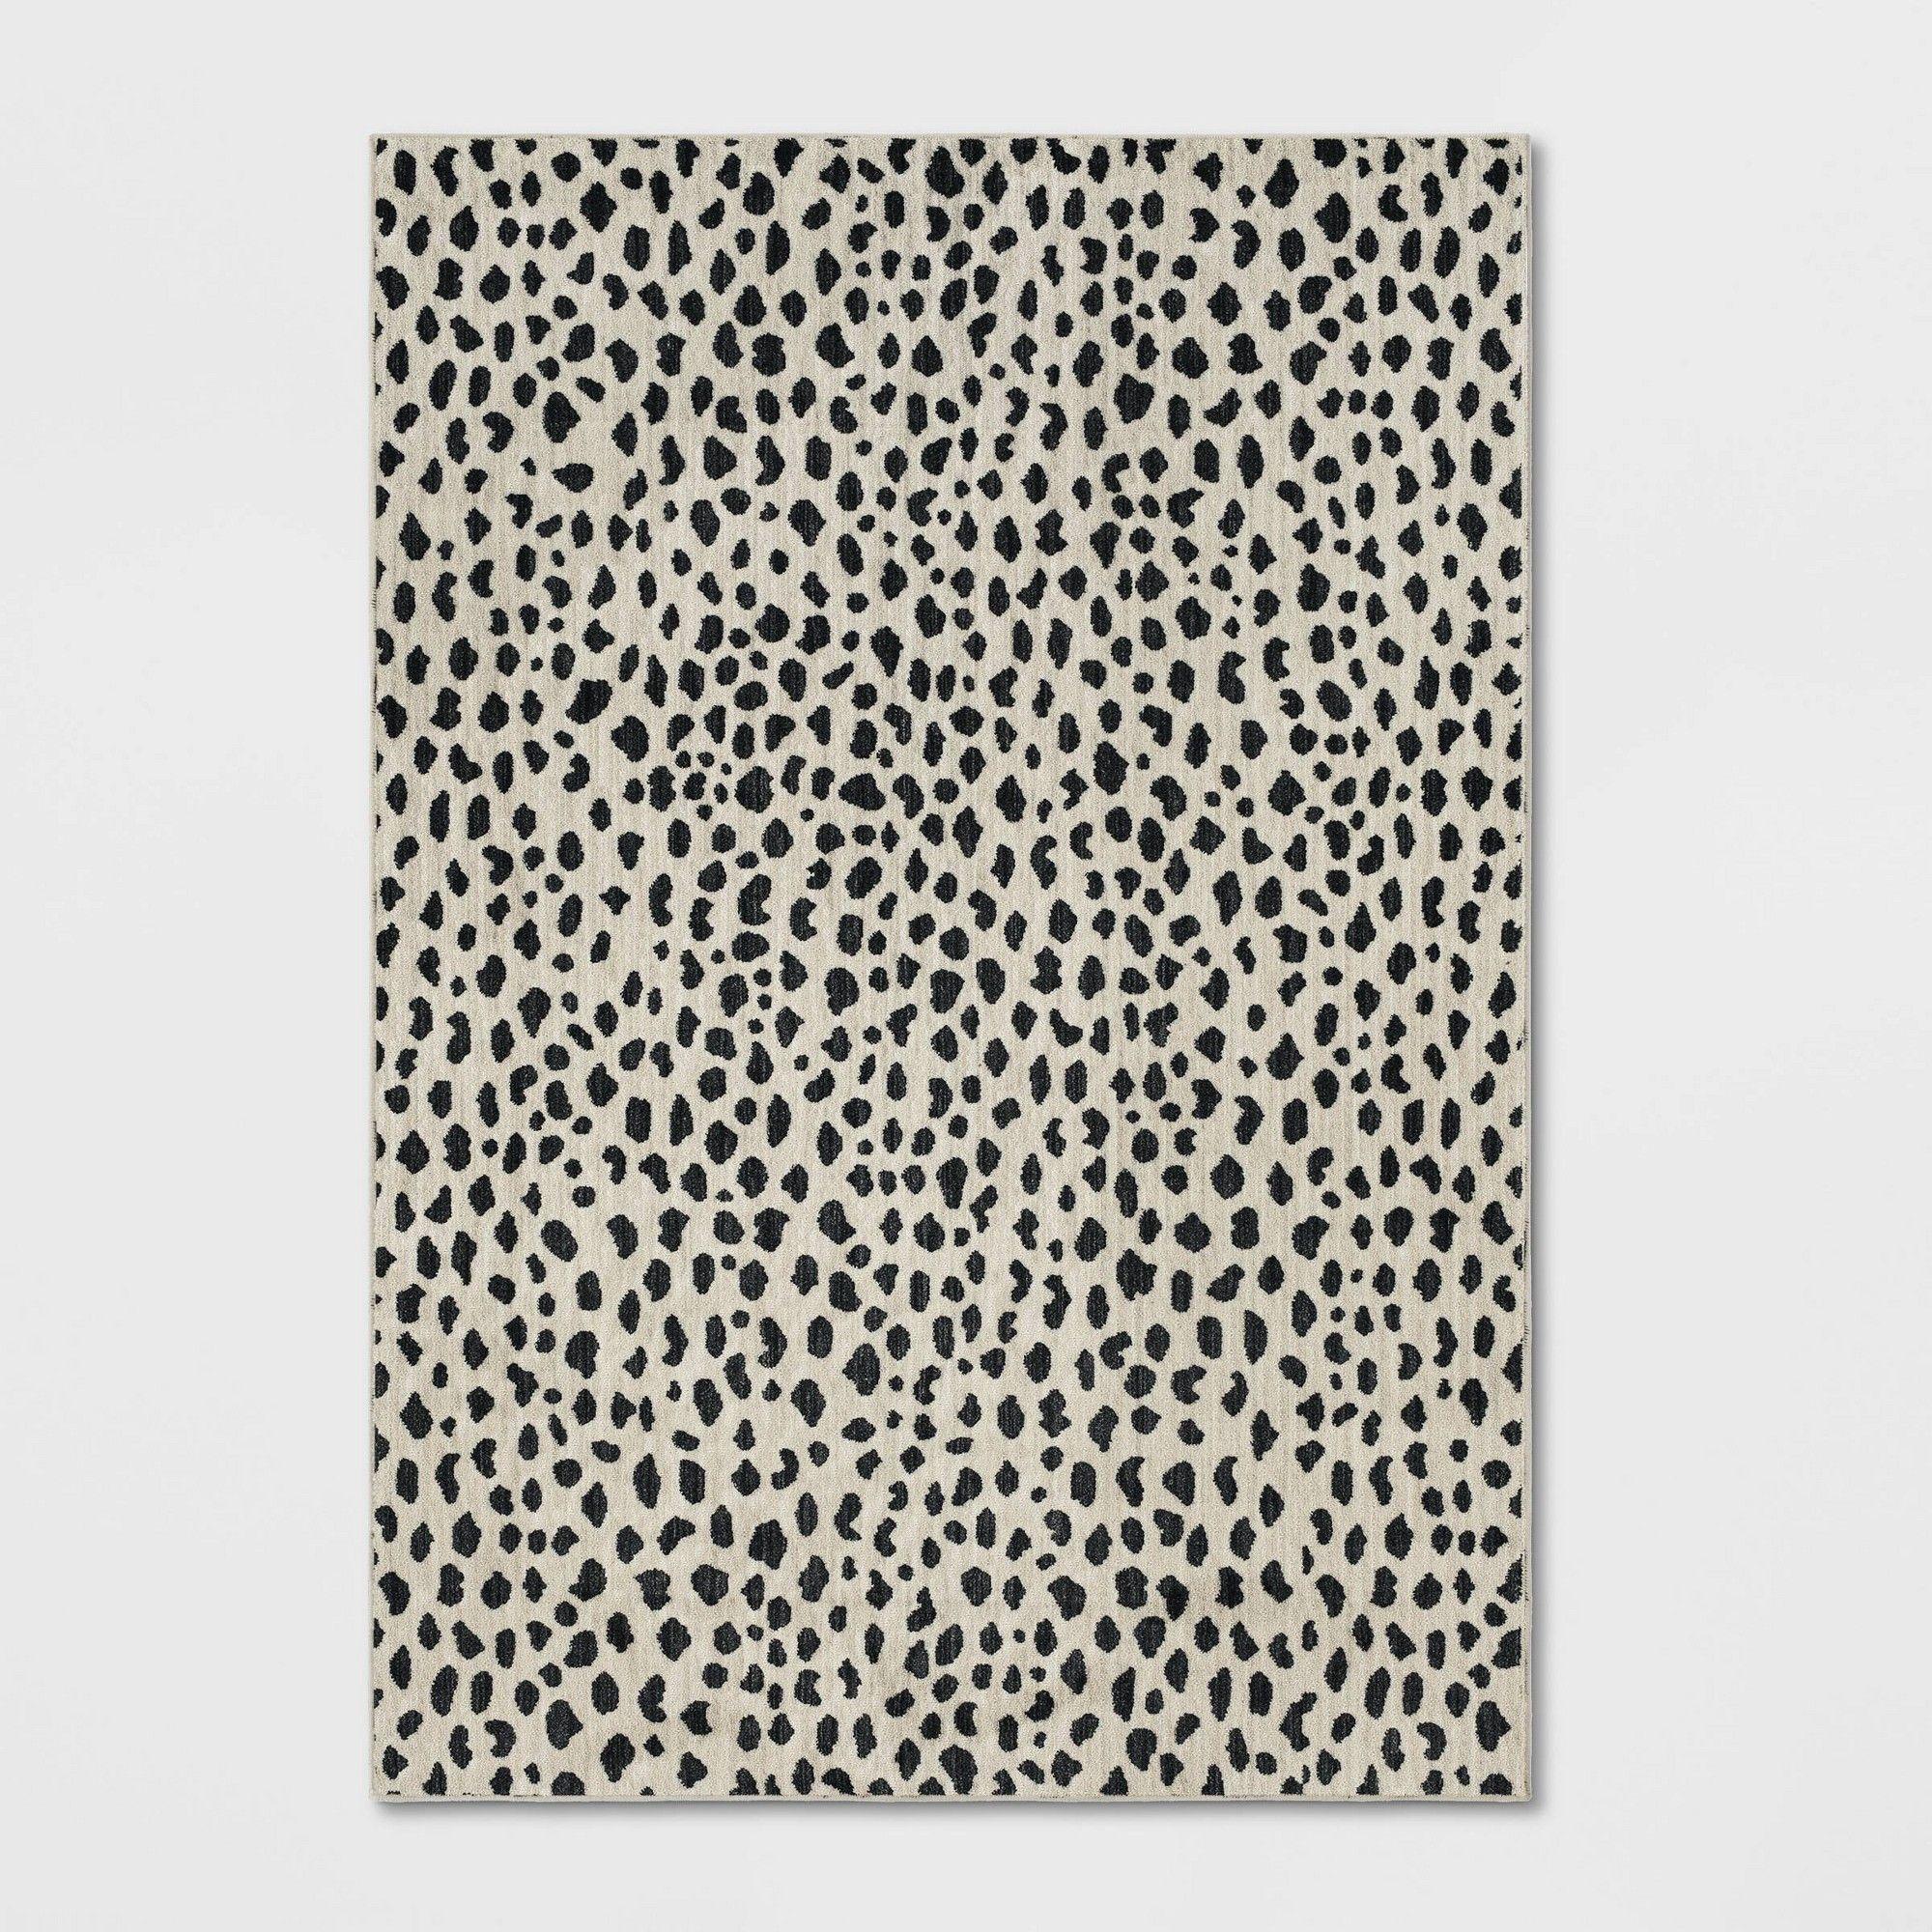 10 X13 Leopard Spot Woven Area Rug Black White Opalhouse